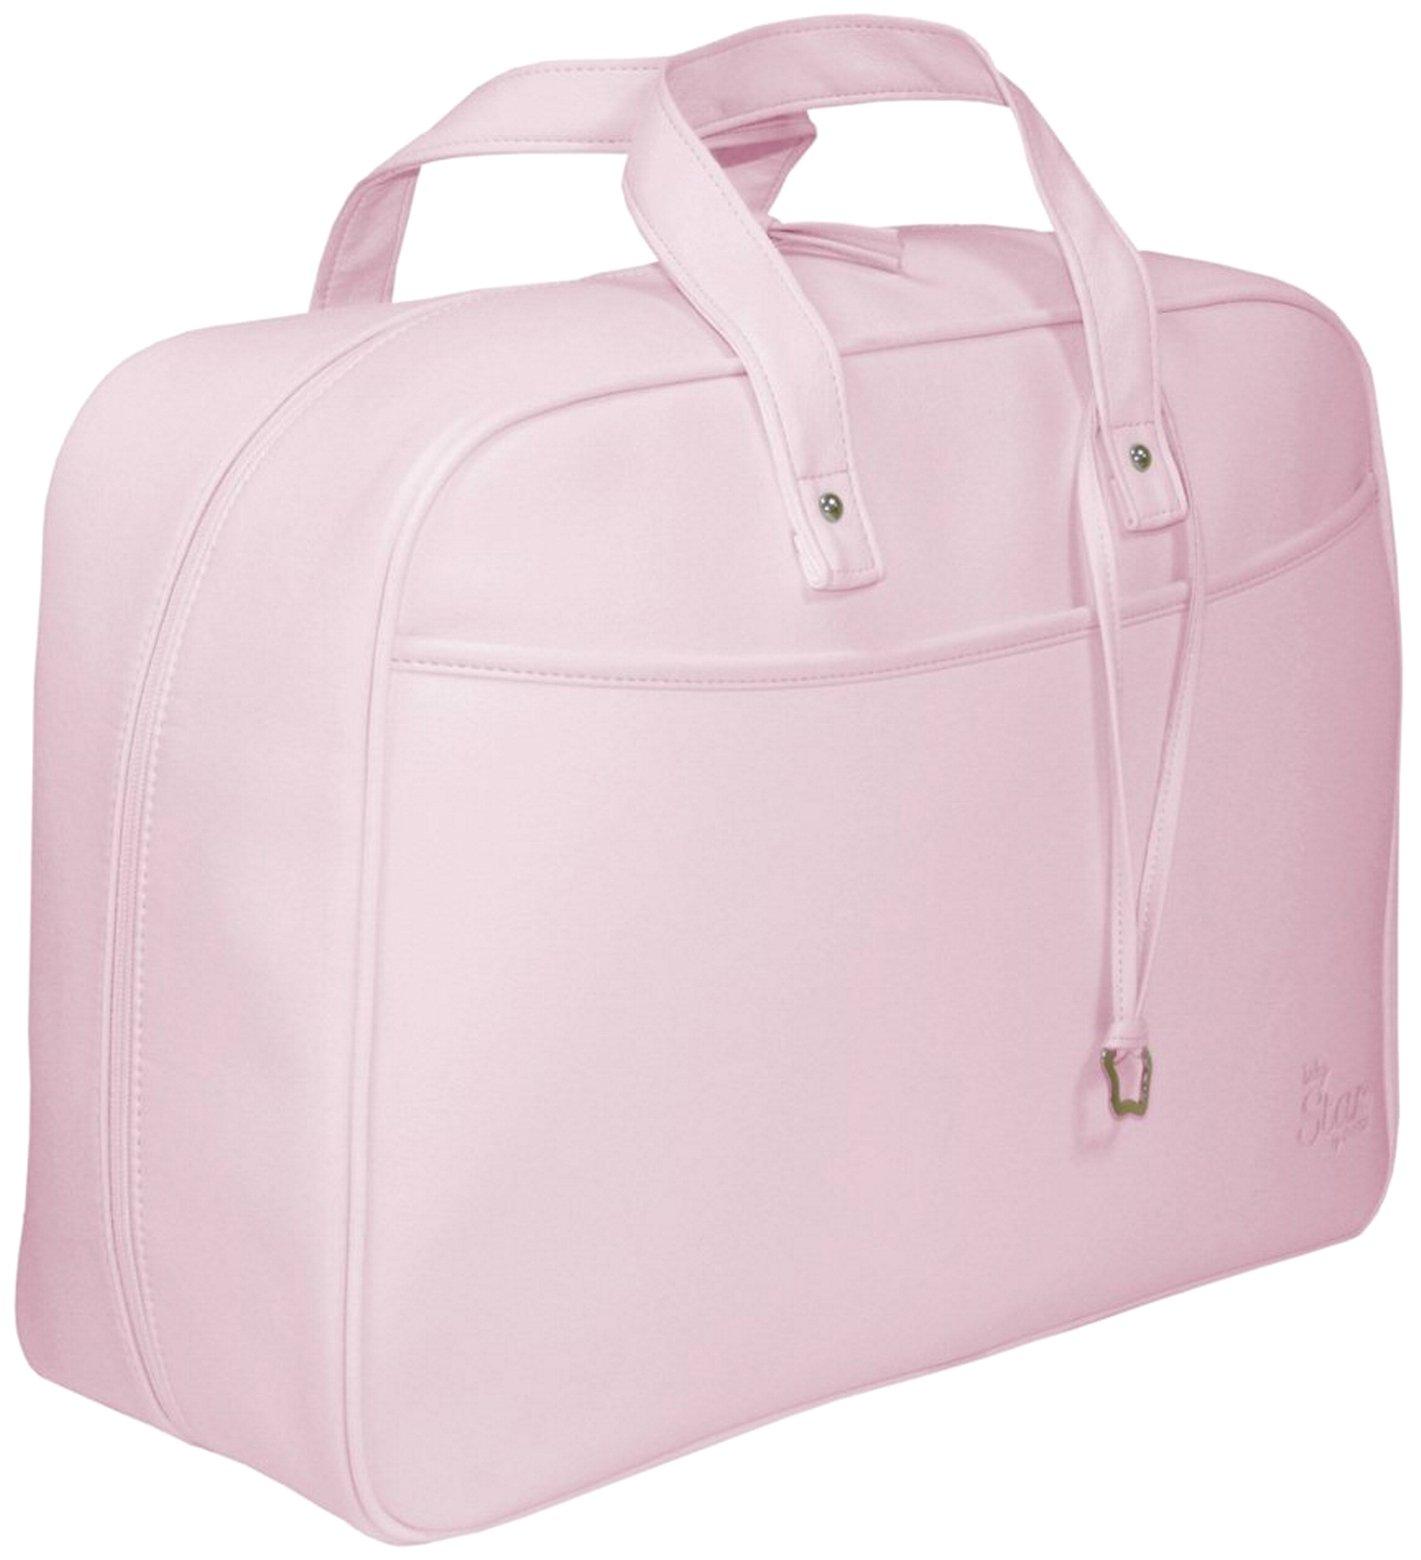 Garessi M12-09, Bolso-maleta de maternidad, Rosa product image